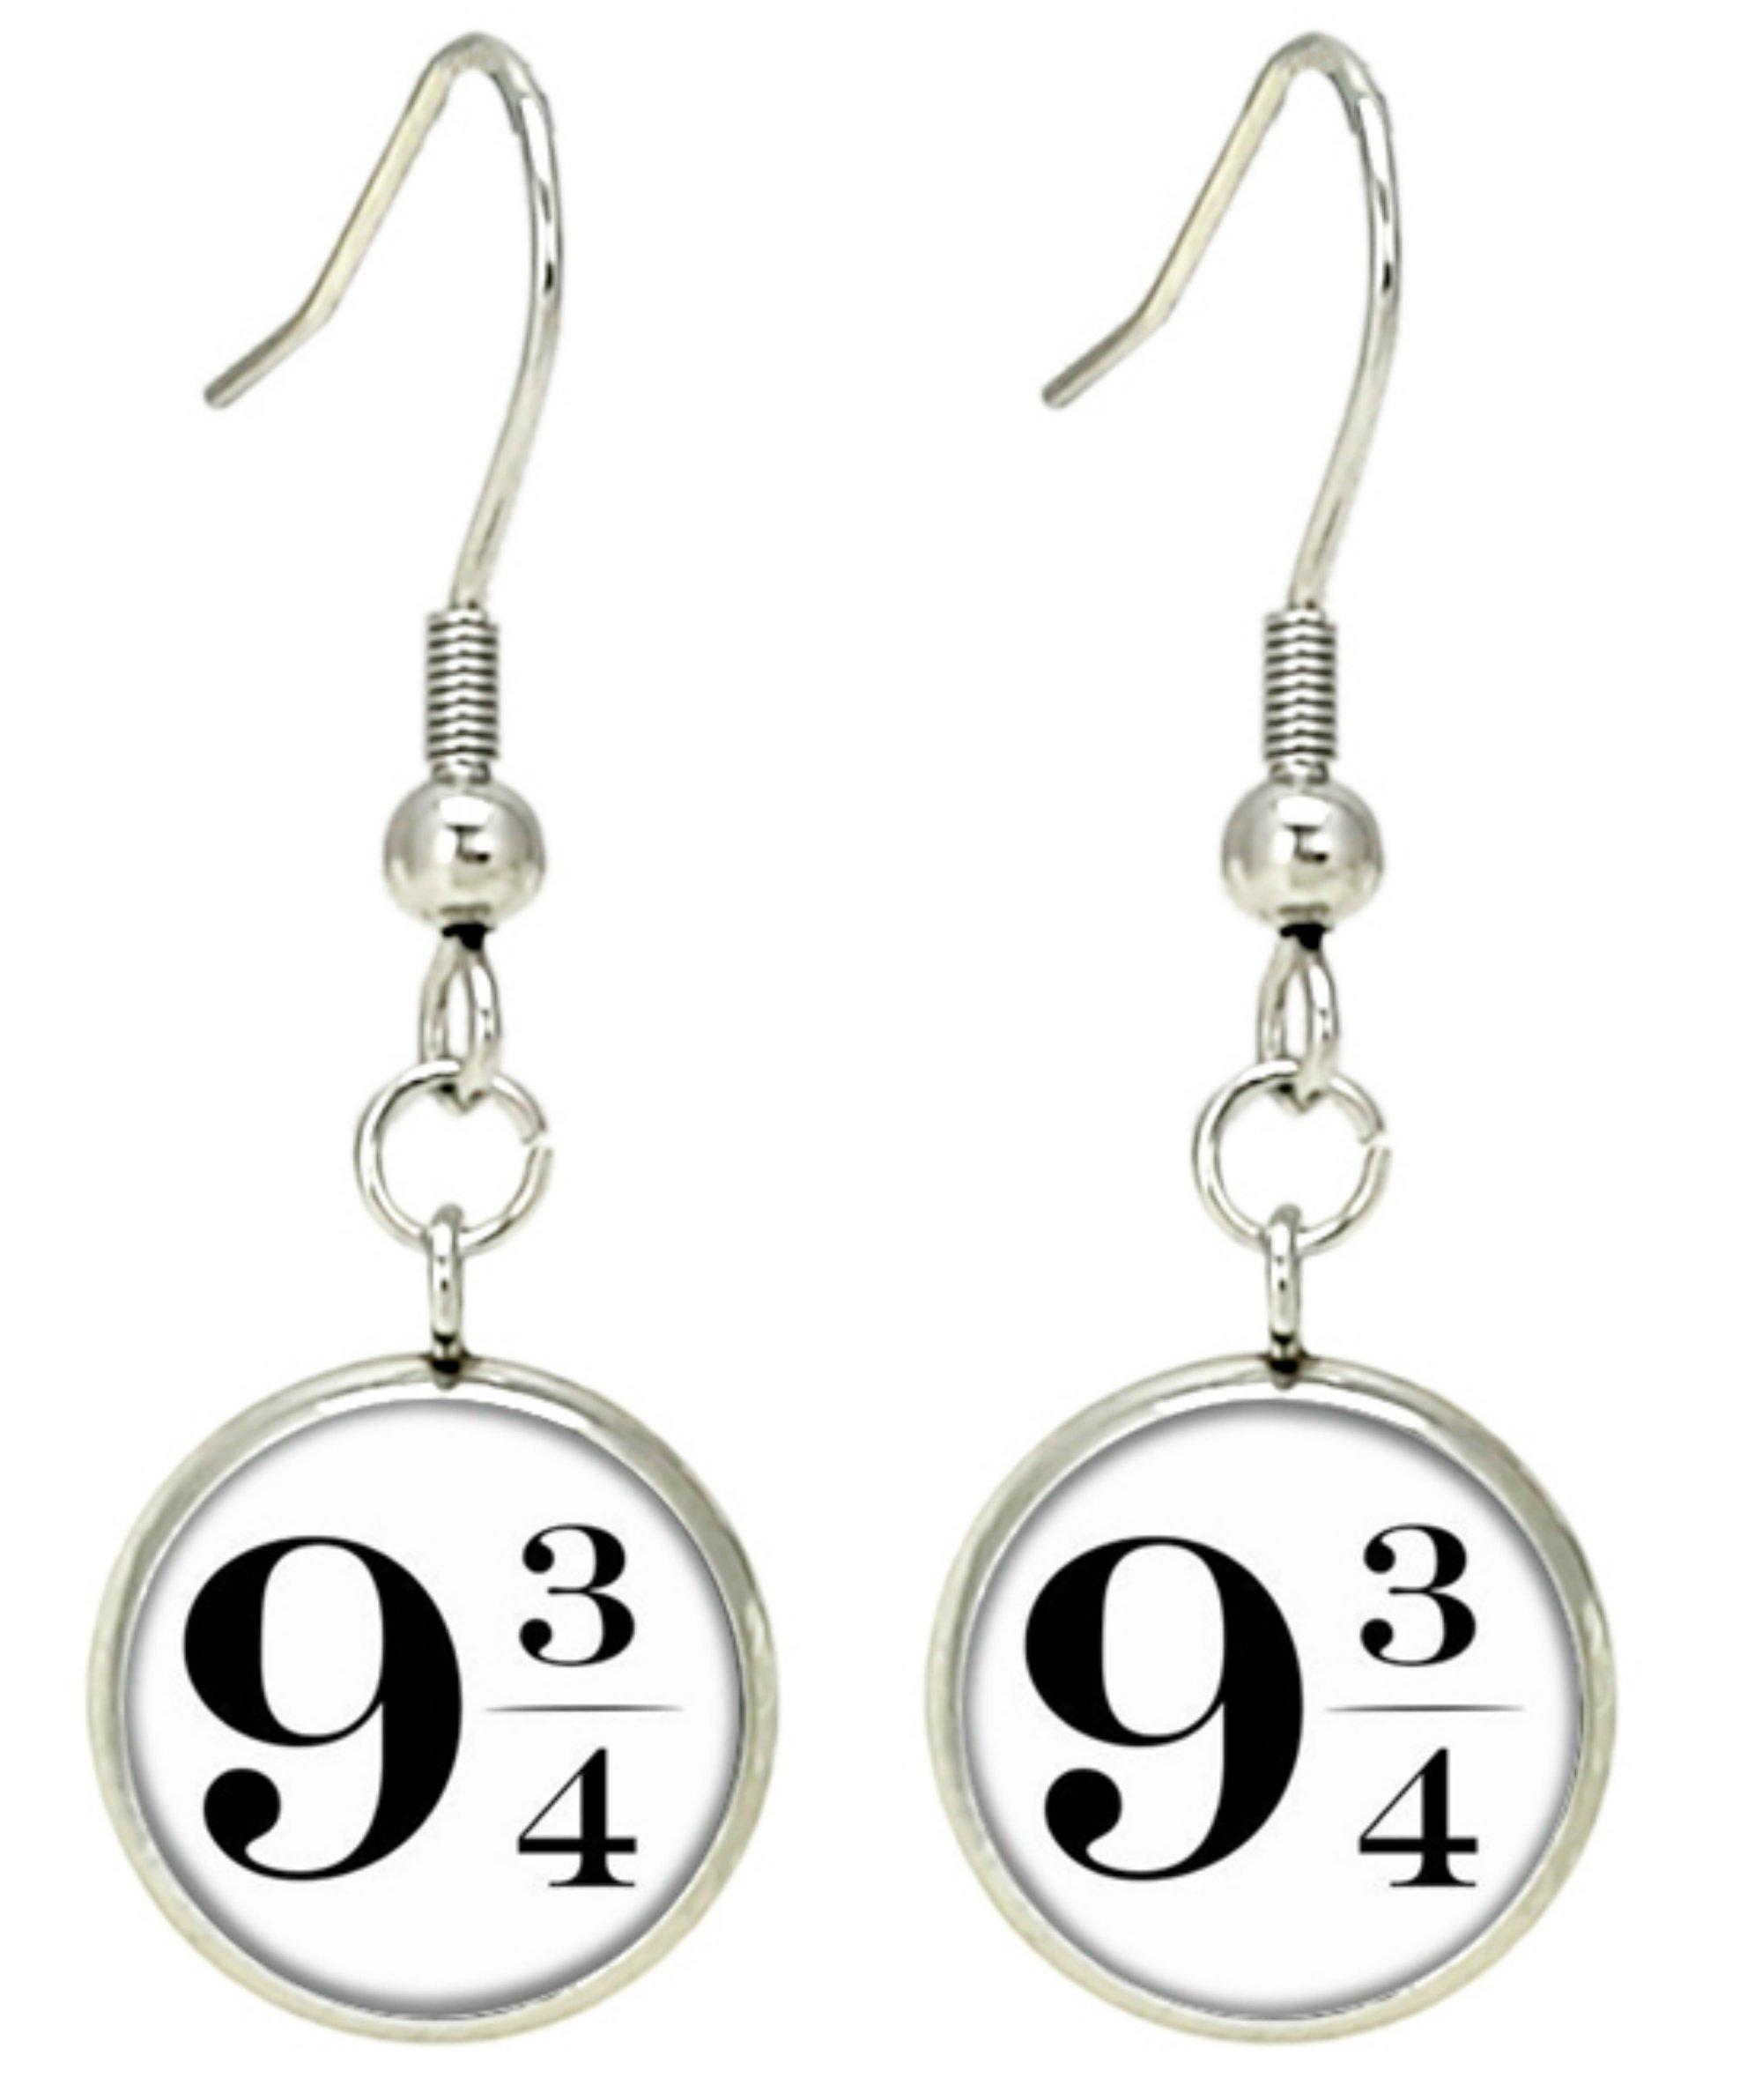 Harry Potter Premium Quality Silvertone Dangle Earrings